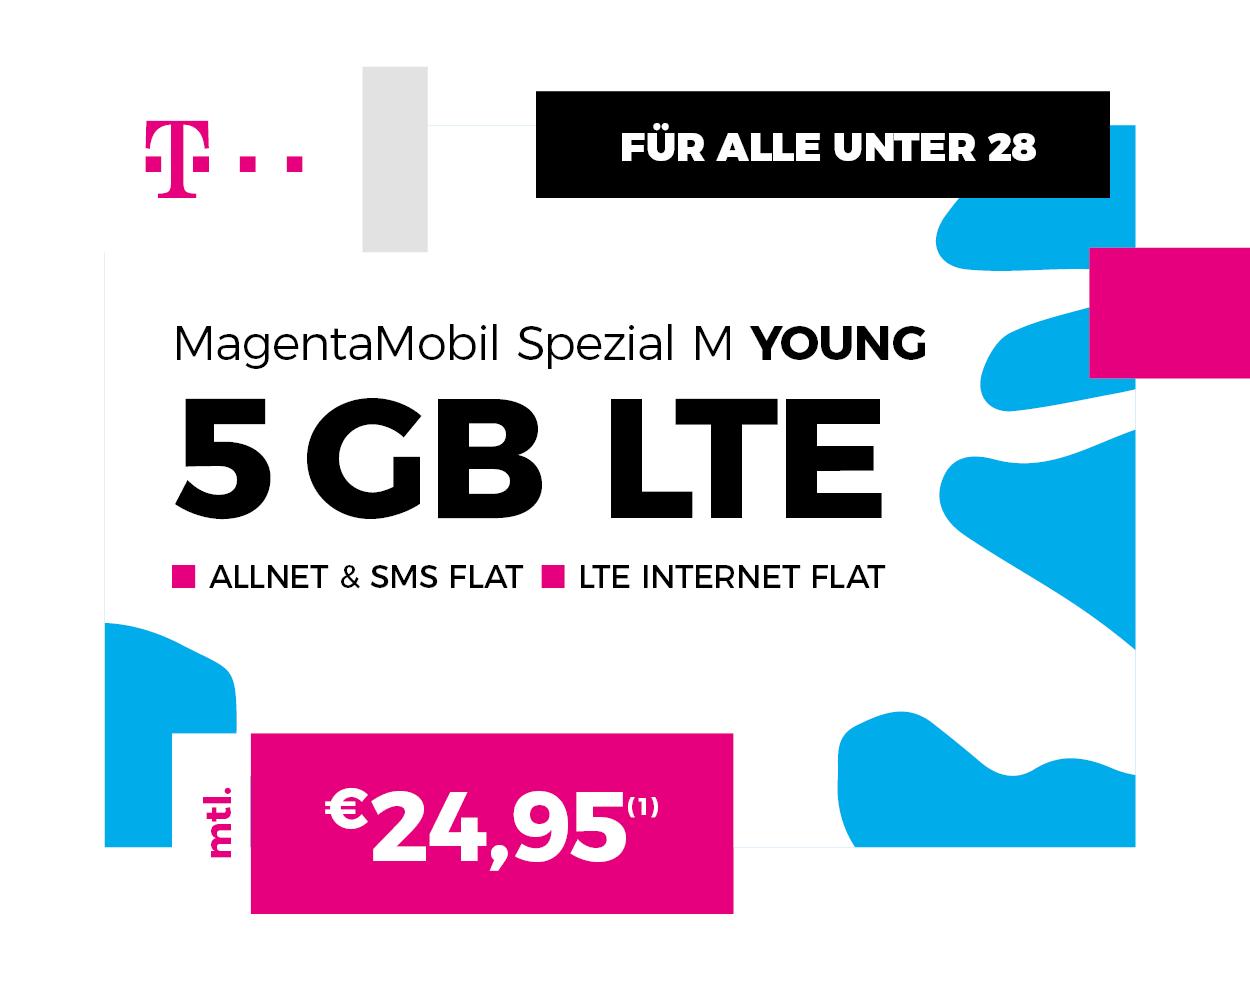 Telekom Deal bei iBuy.de, junge Leute, Special Tarife